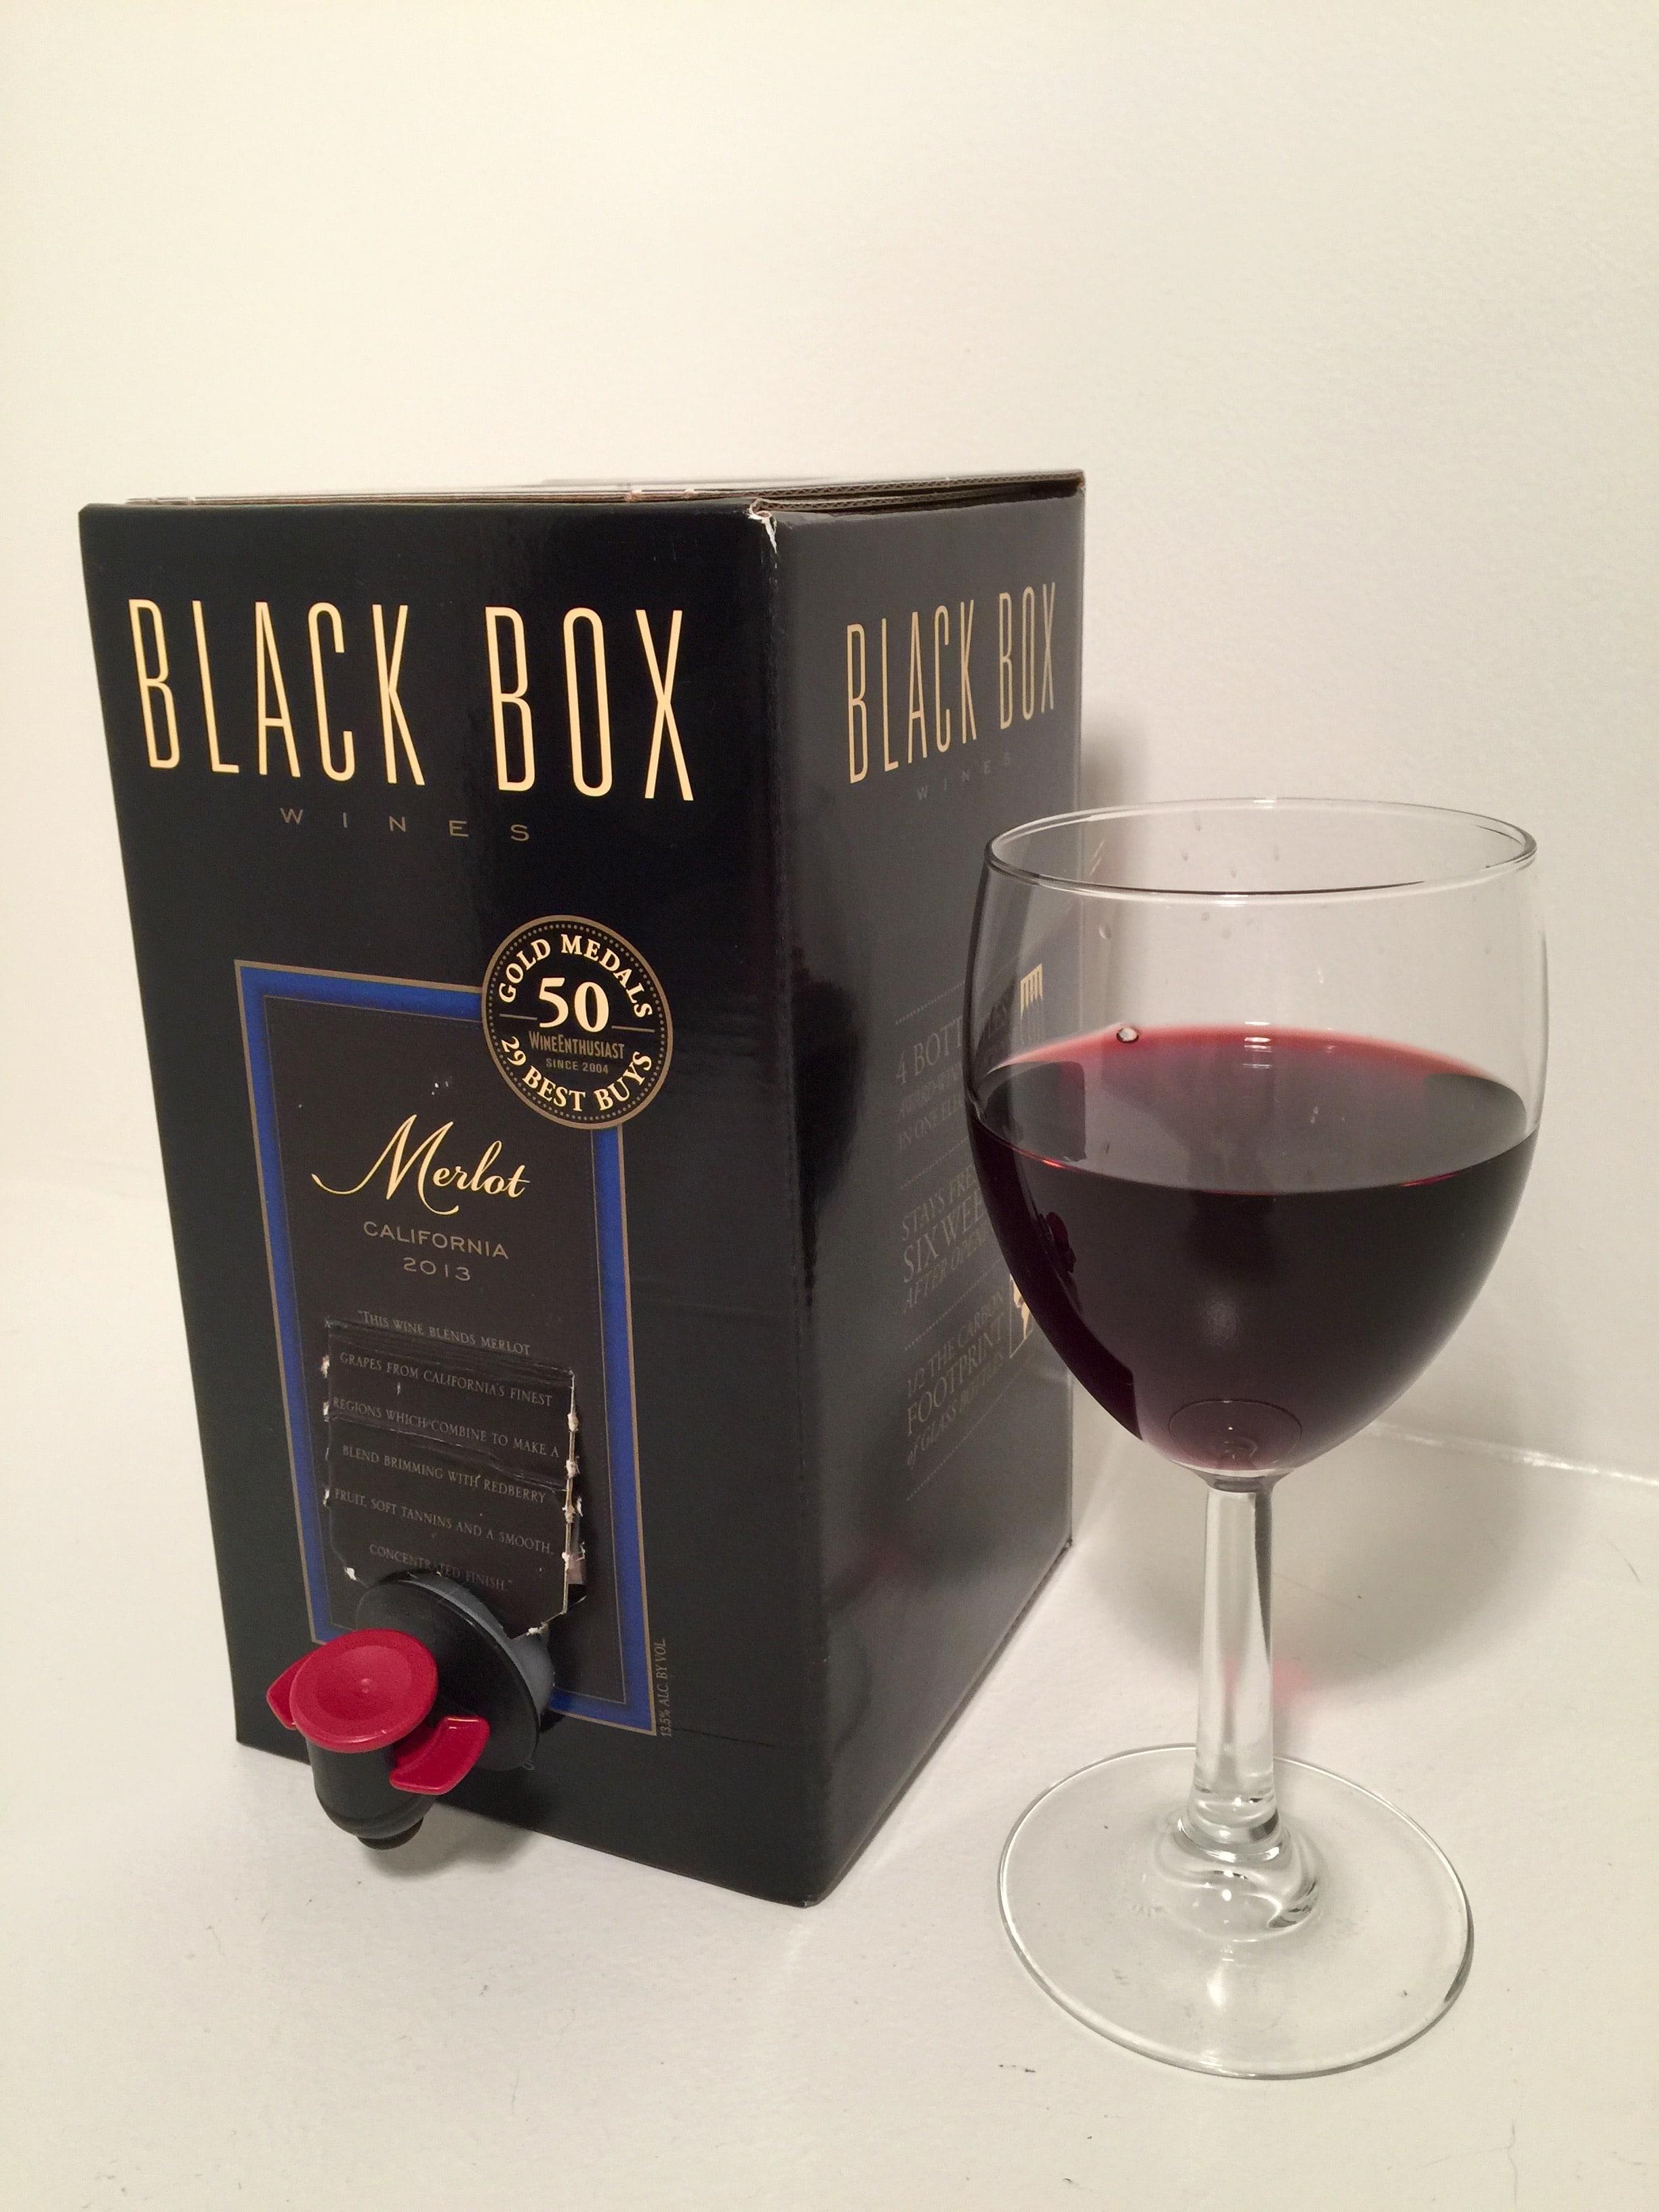 Black Box Wine Merlot